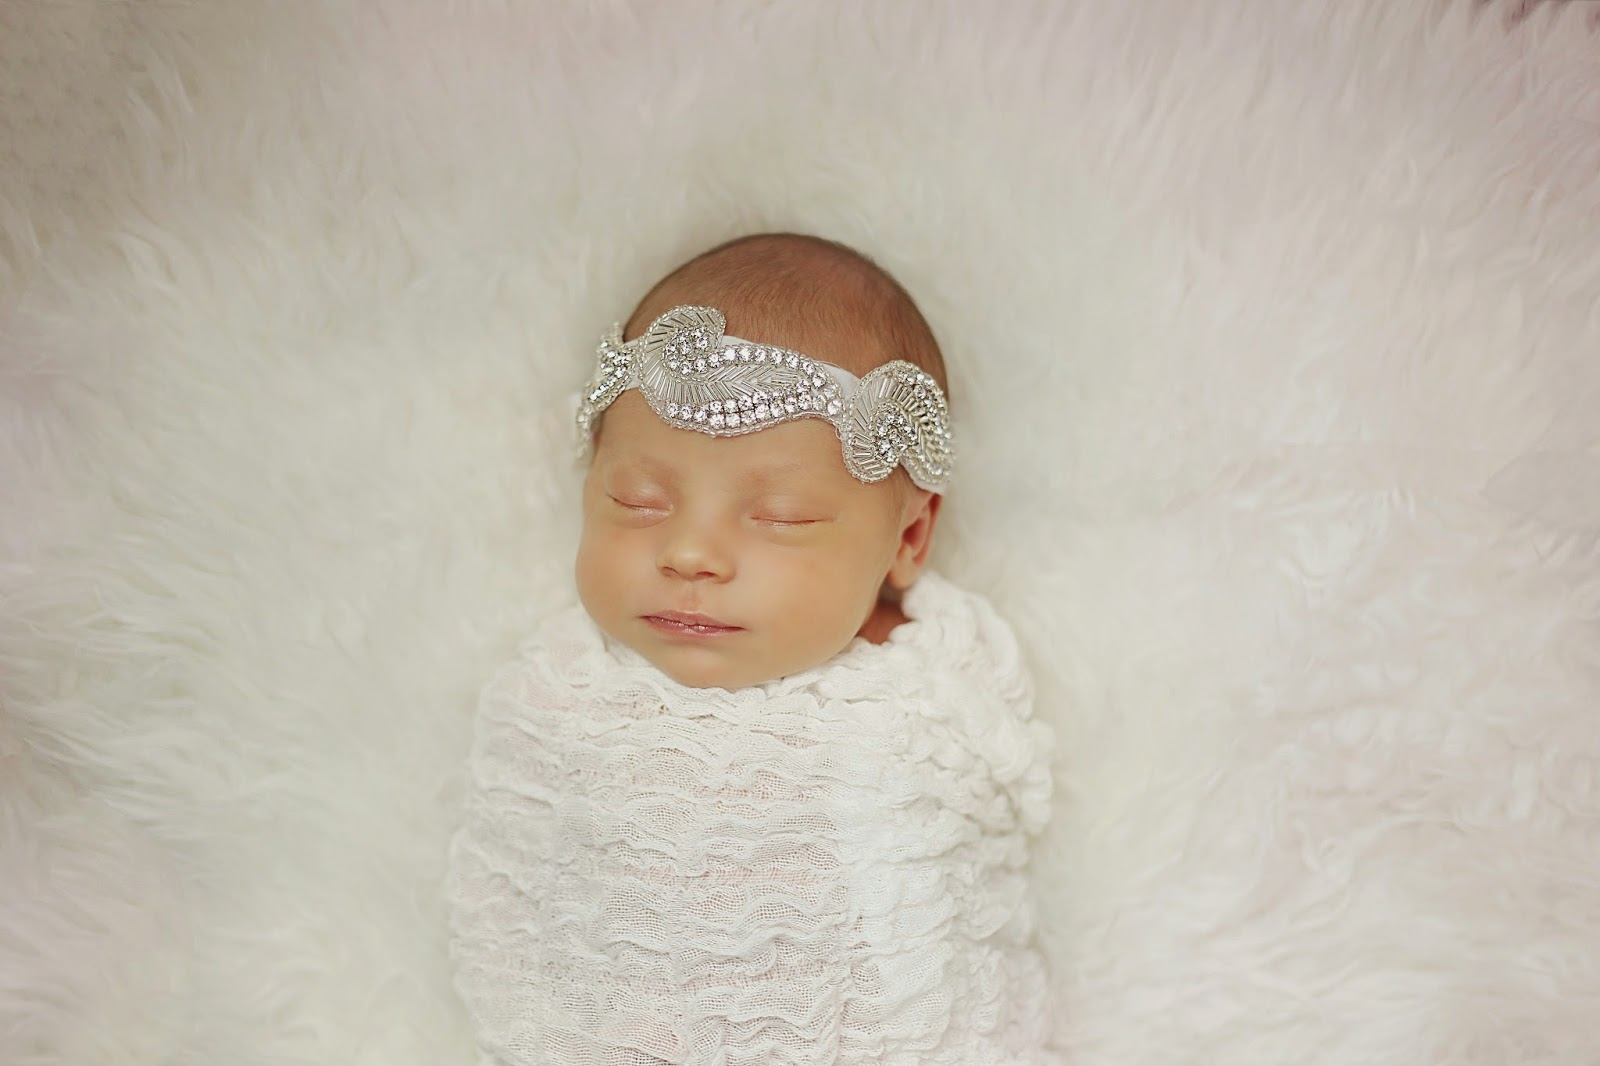 newborn, baby, girl, newborn photography, portland newborn, studio, natural light, jenn pacurar, spotted stills photography